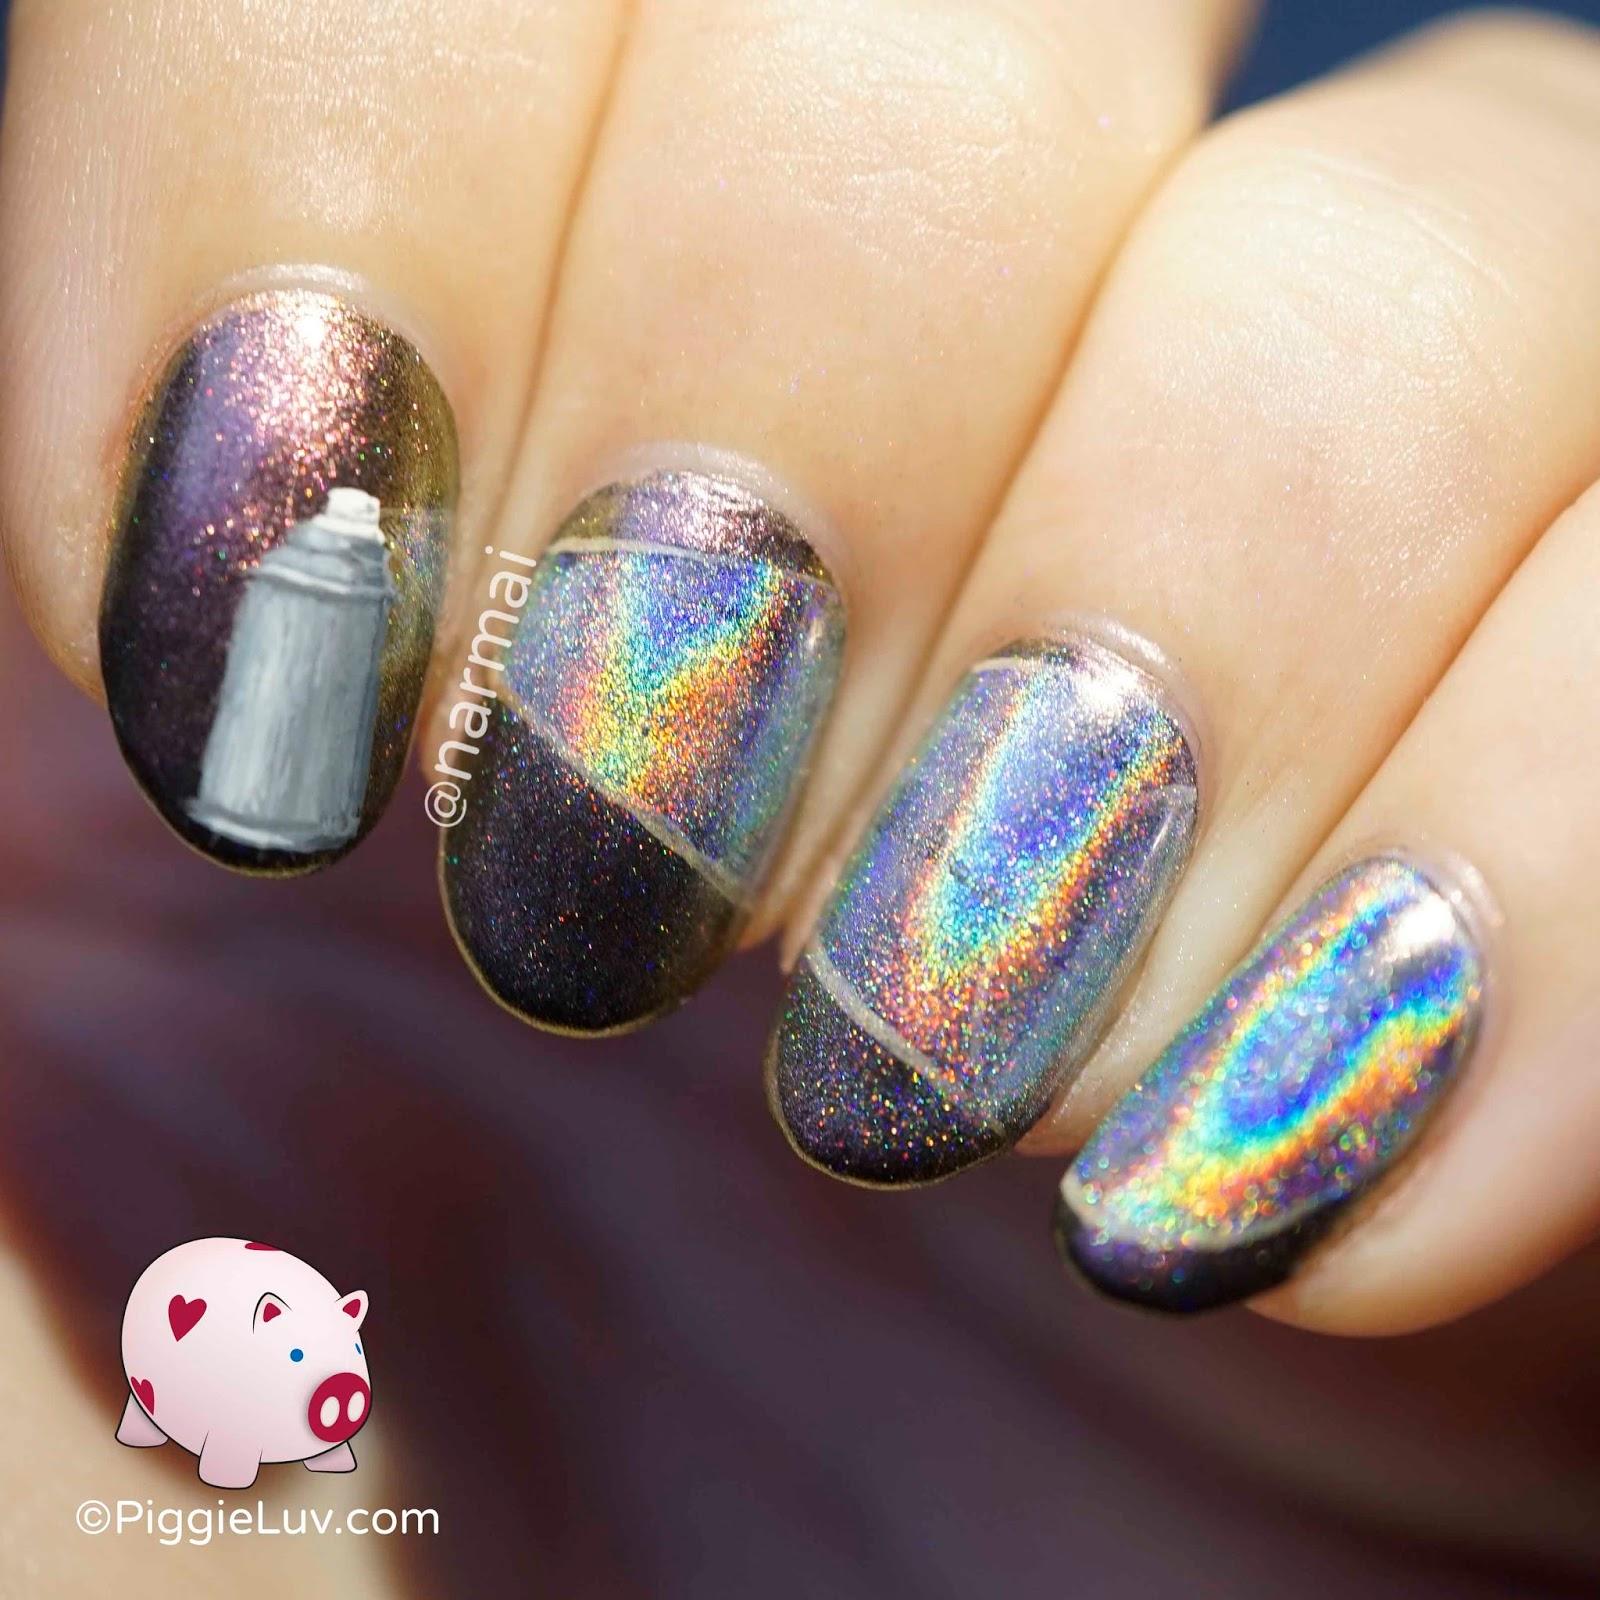 Piggieluv Holo Spray Paint Nail Art